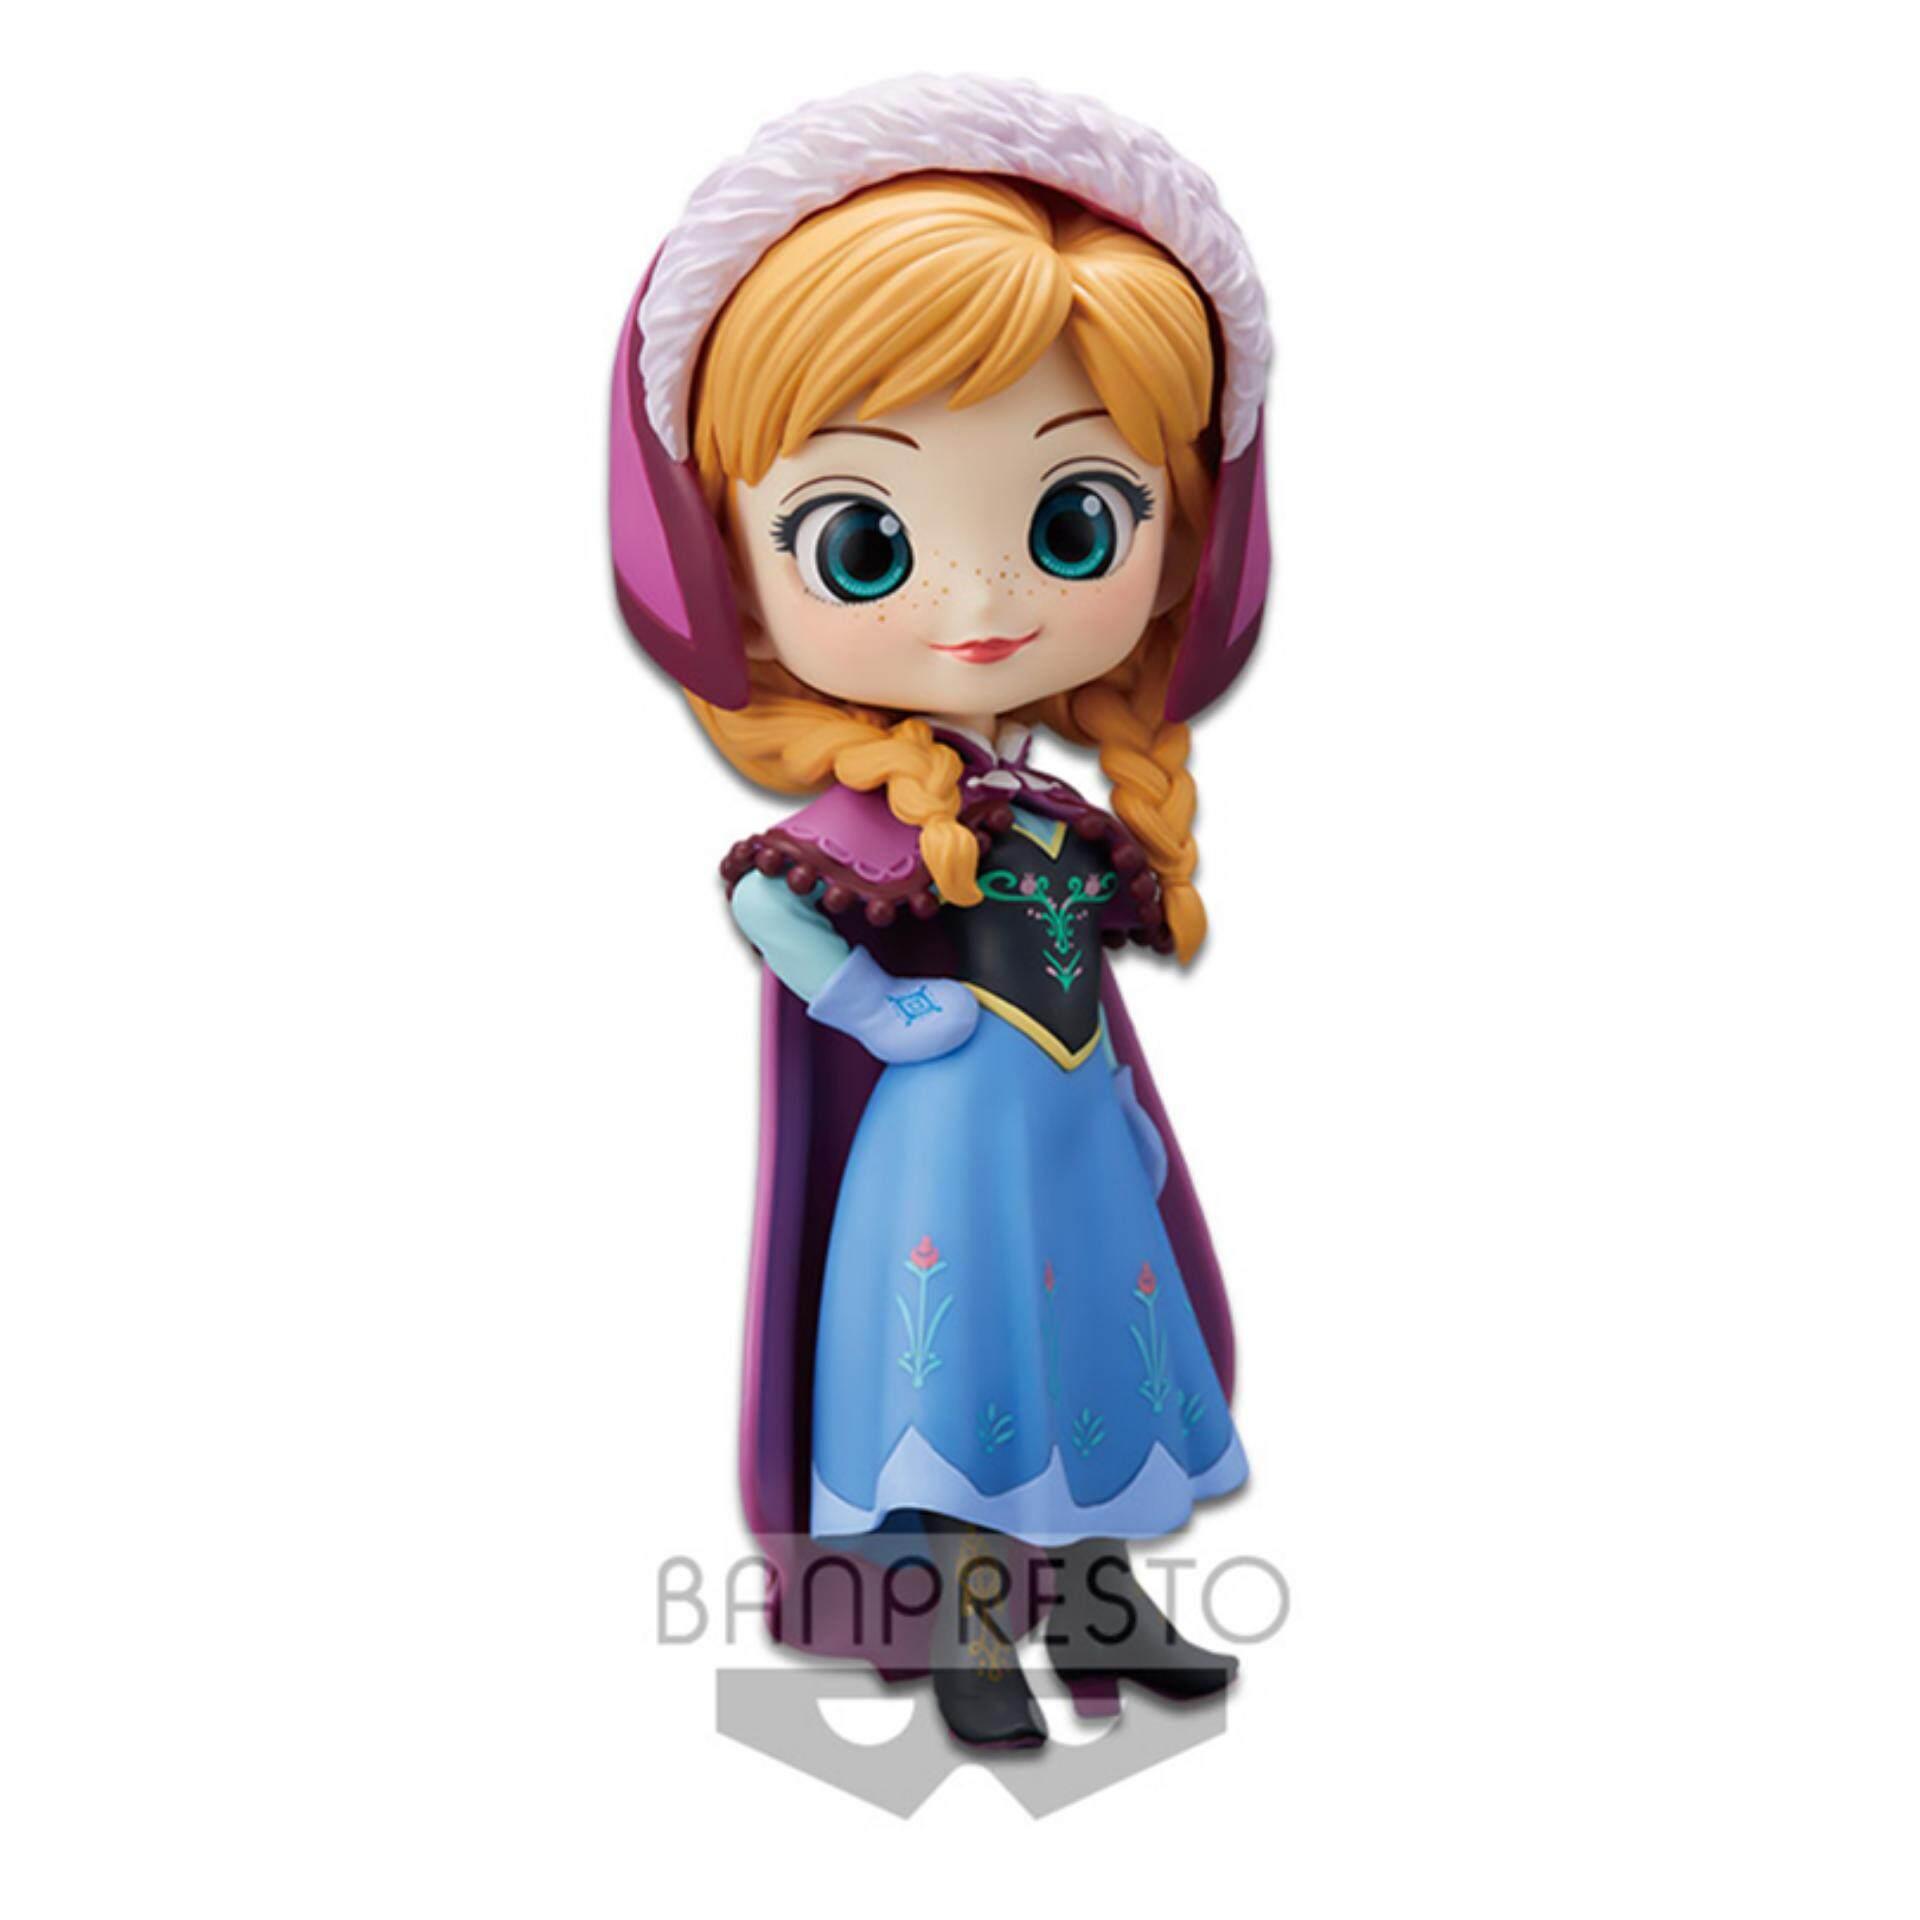 Banpresto Q Posket Disney Princess Figure Pastel Version - Anna Toys for boys